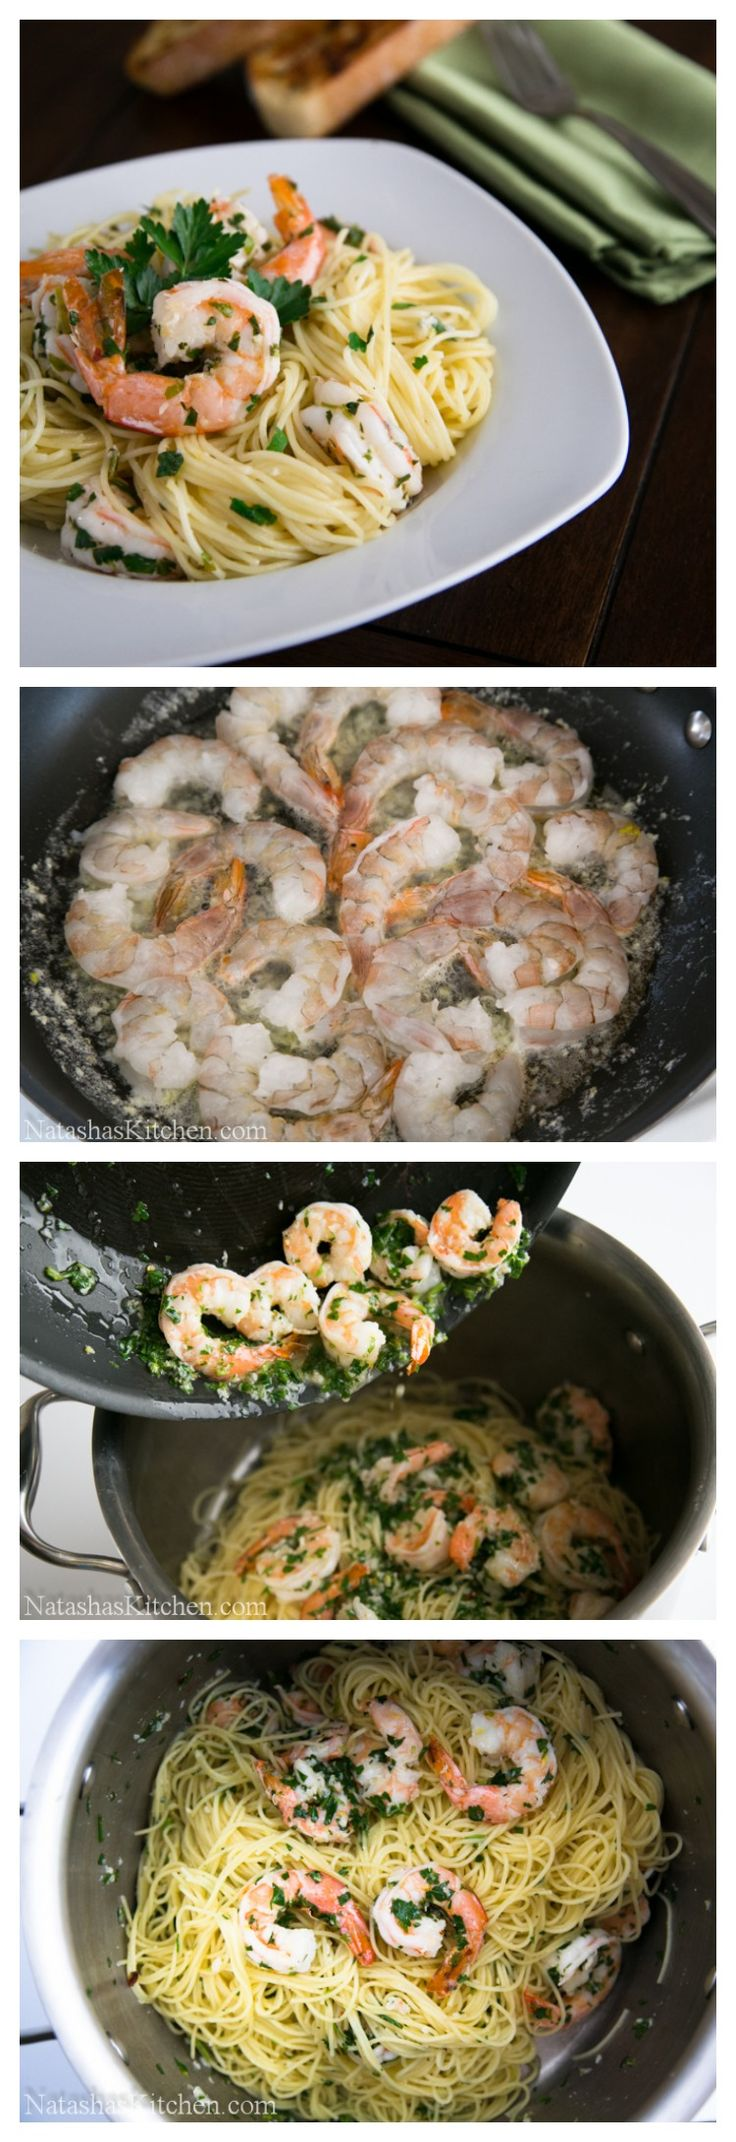 Lemon Shrimp Scampi with Angel Hair Pasta! Done in under 30 min! @NatashasKitchen